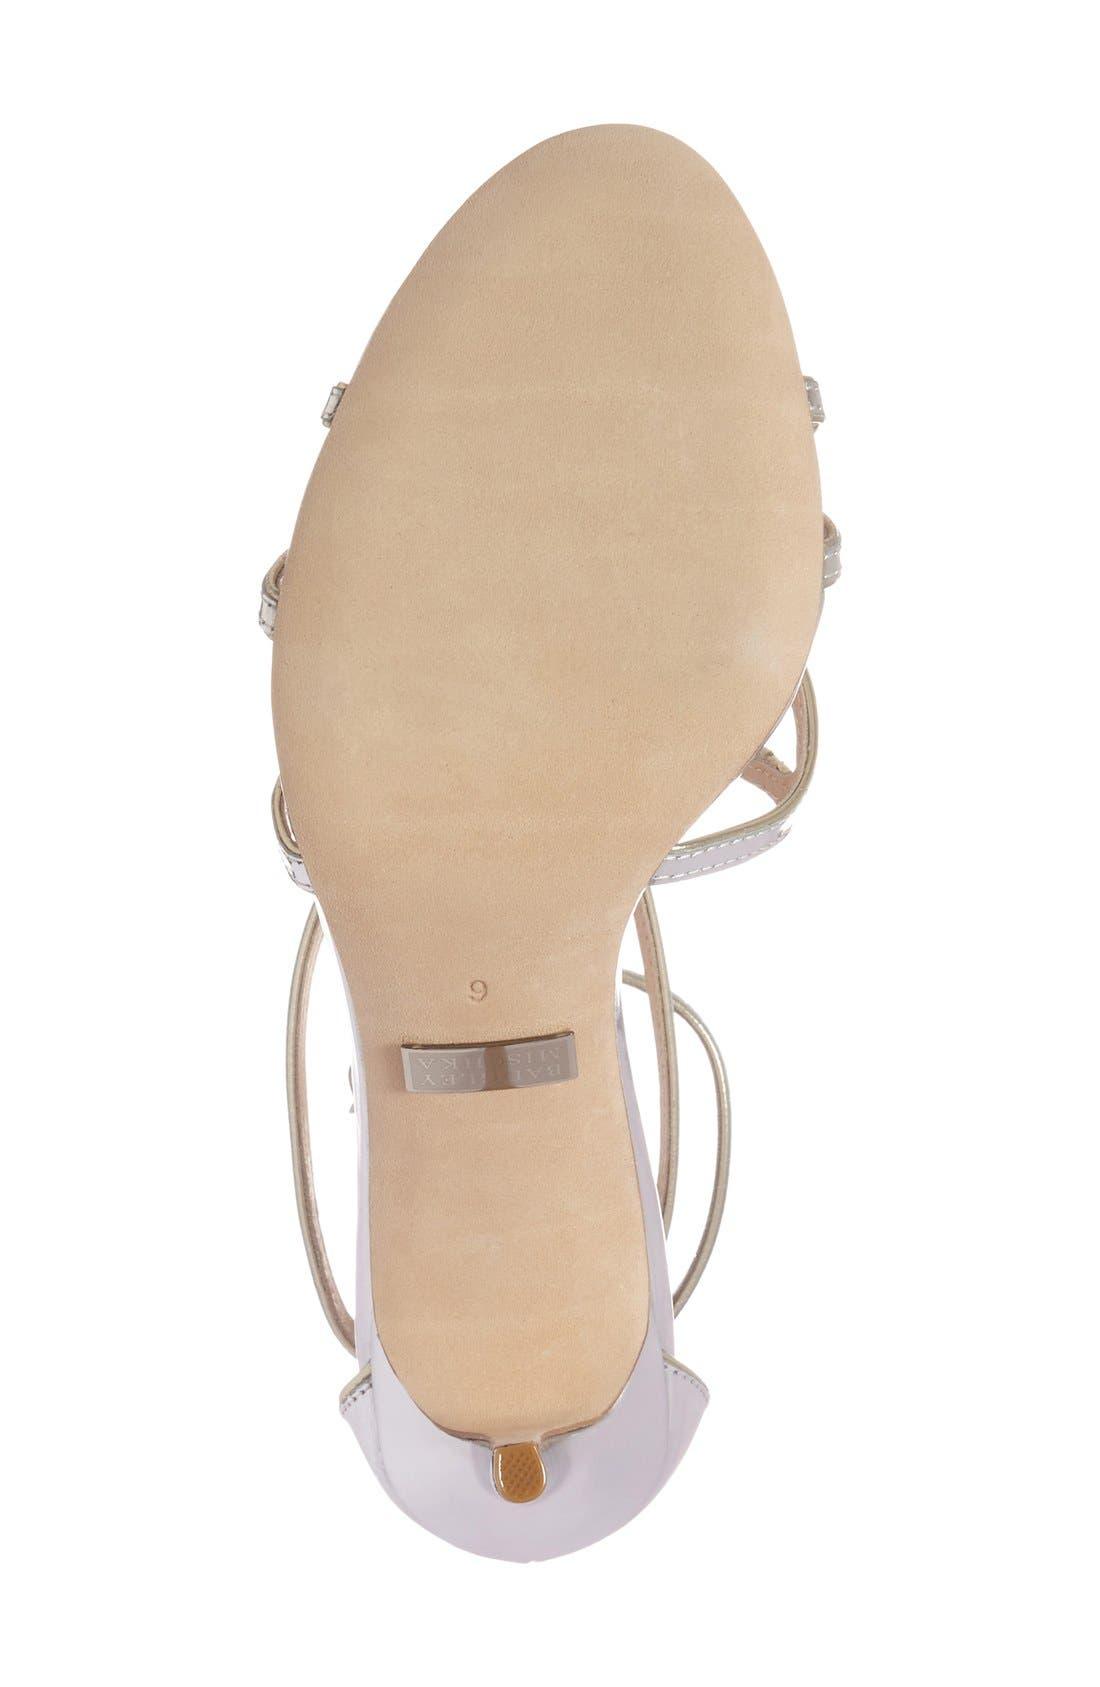 BADGLEY MISCHKA COLLECTION,                             Badgley Mischka 'Lillian' Metallic Evening Sandal,                             Alternate thumbnail 2, color,                             046